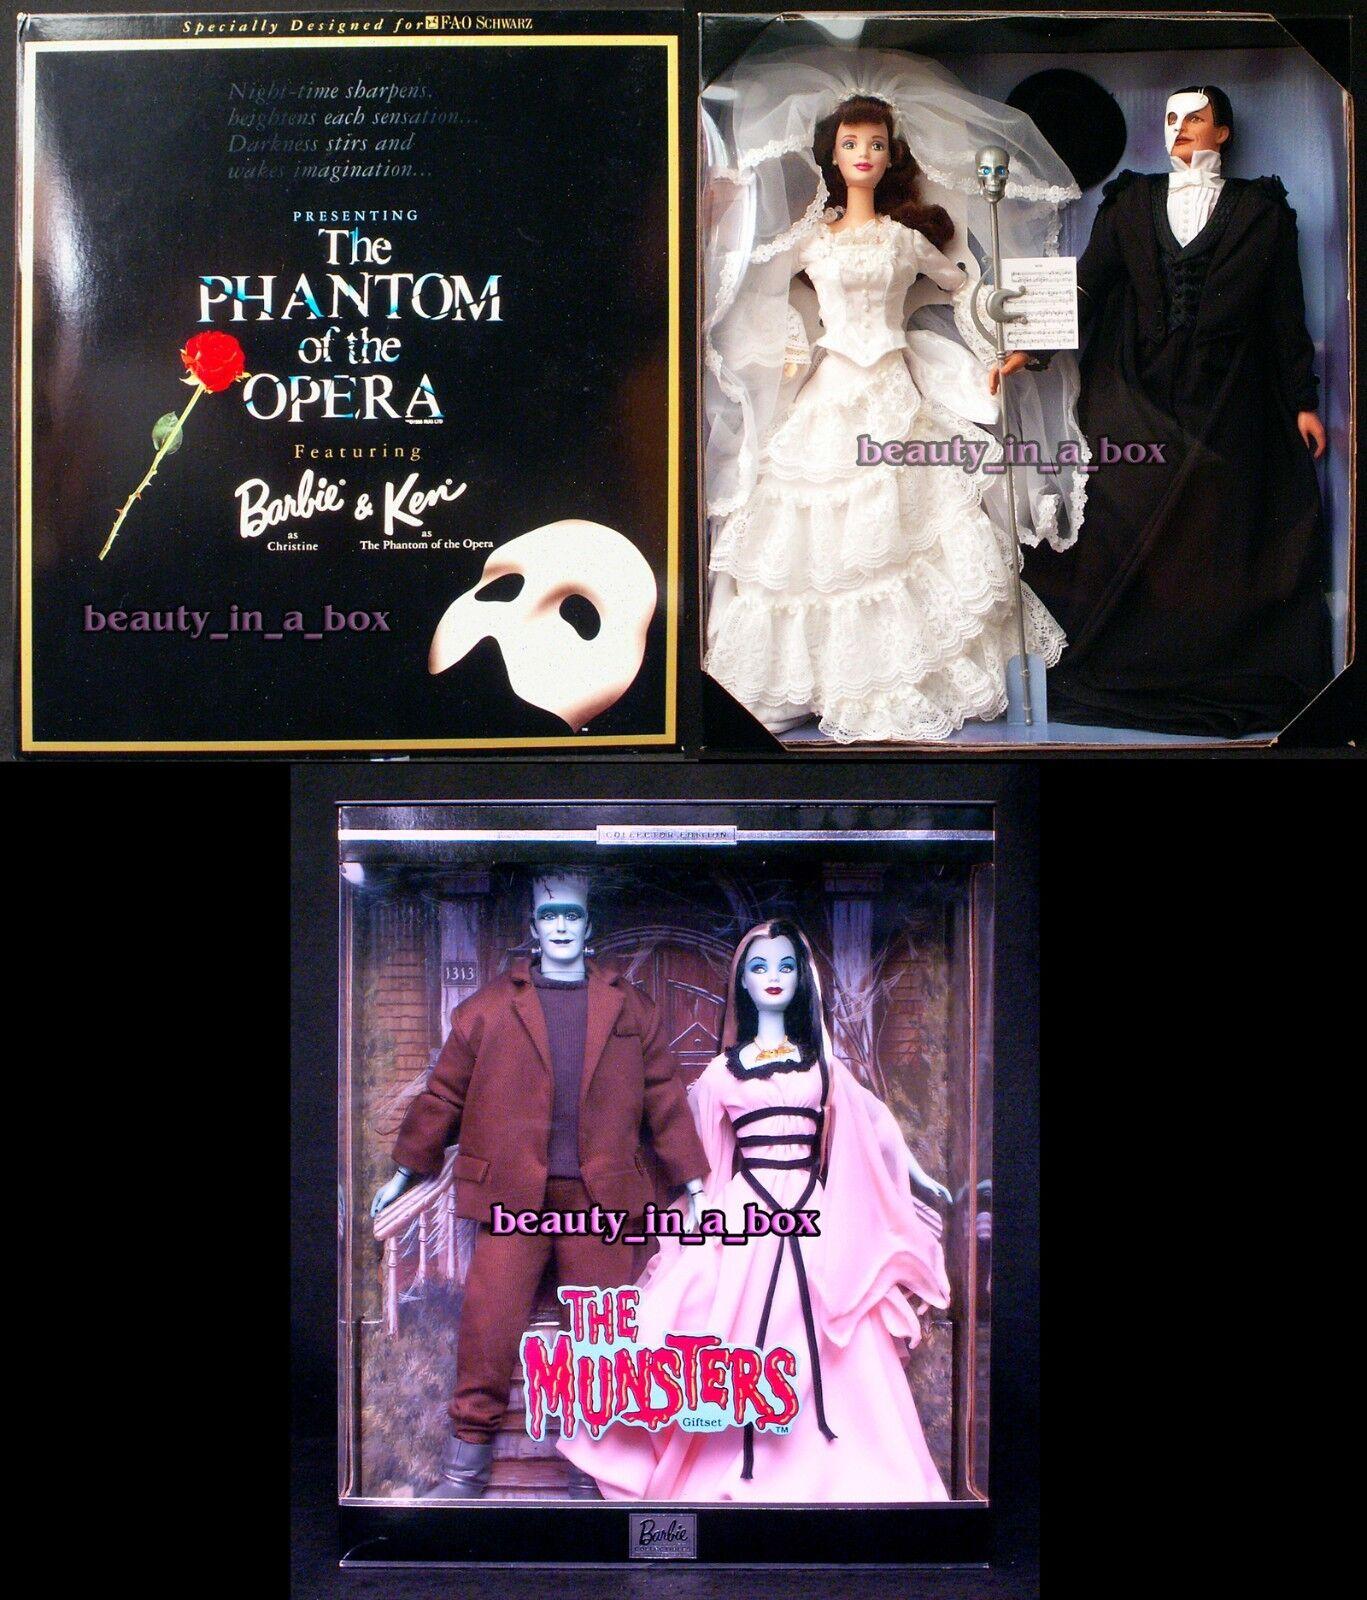 Muñeca Barbie Fantasma de la ópera Munsters Lily Herman Ken nunca quitado de la Caja Lote 2 halloweeng